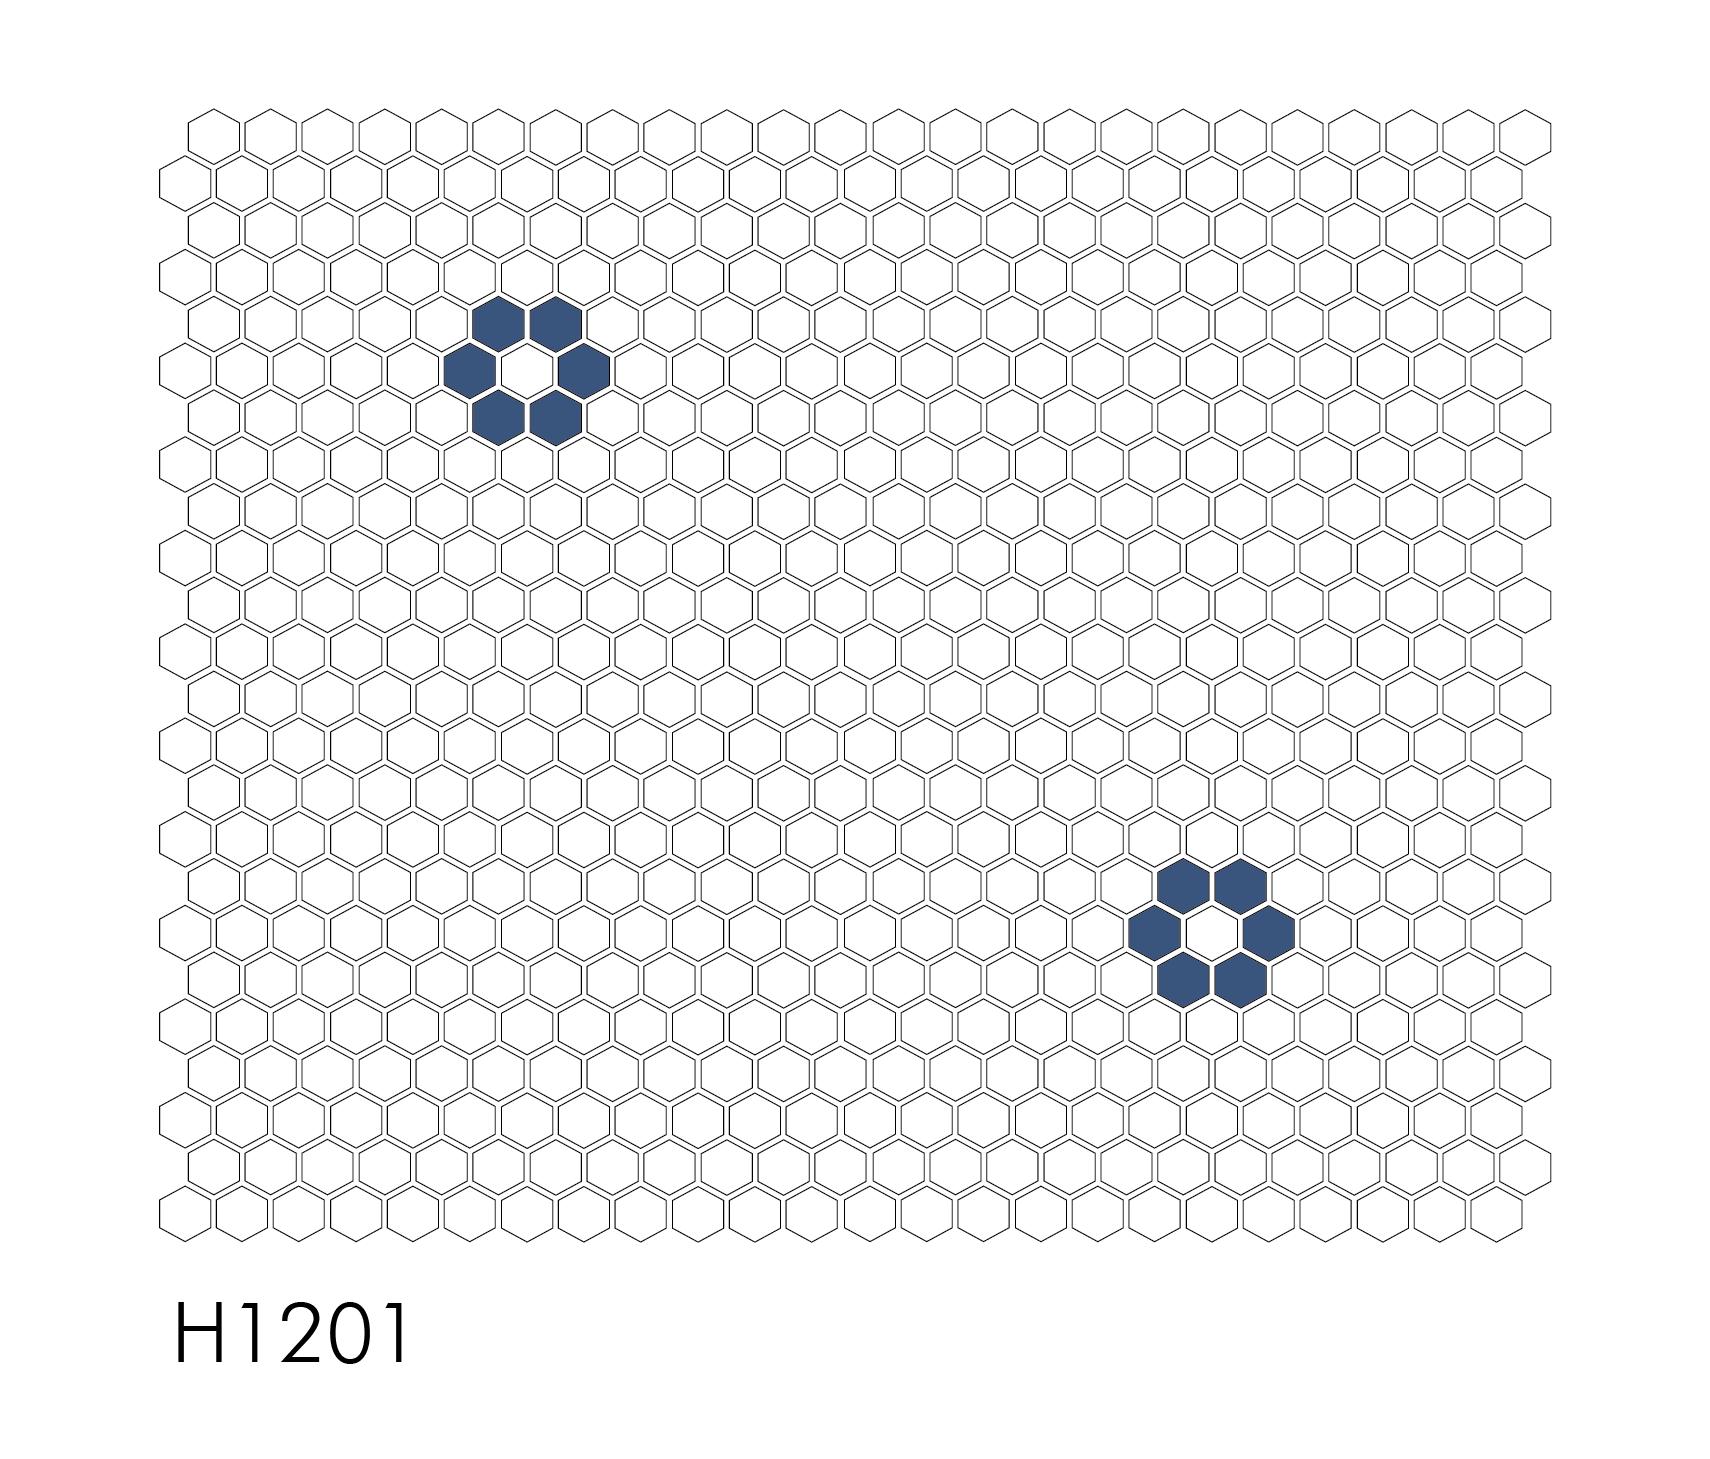 "H1201 Single Rosette 1"" Hexagon Mosaic"